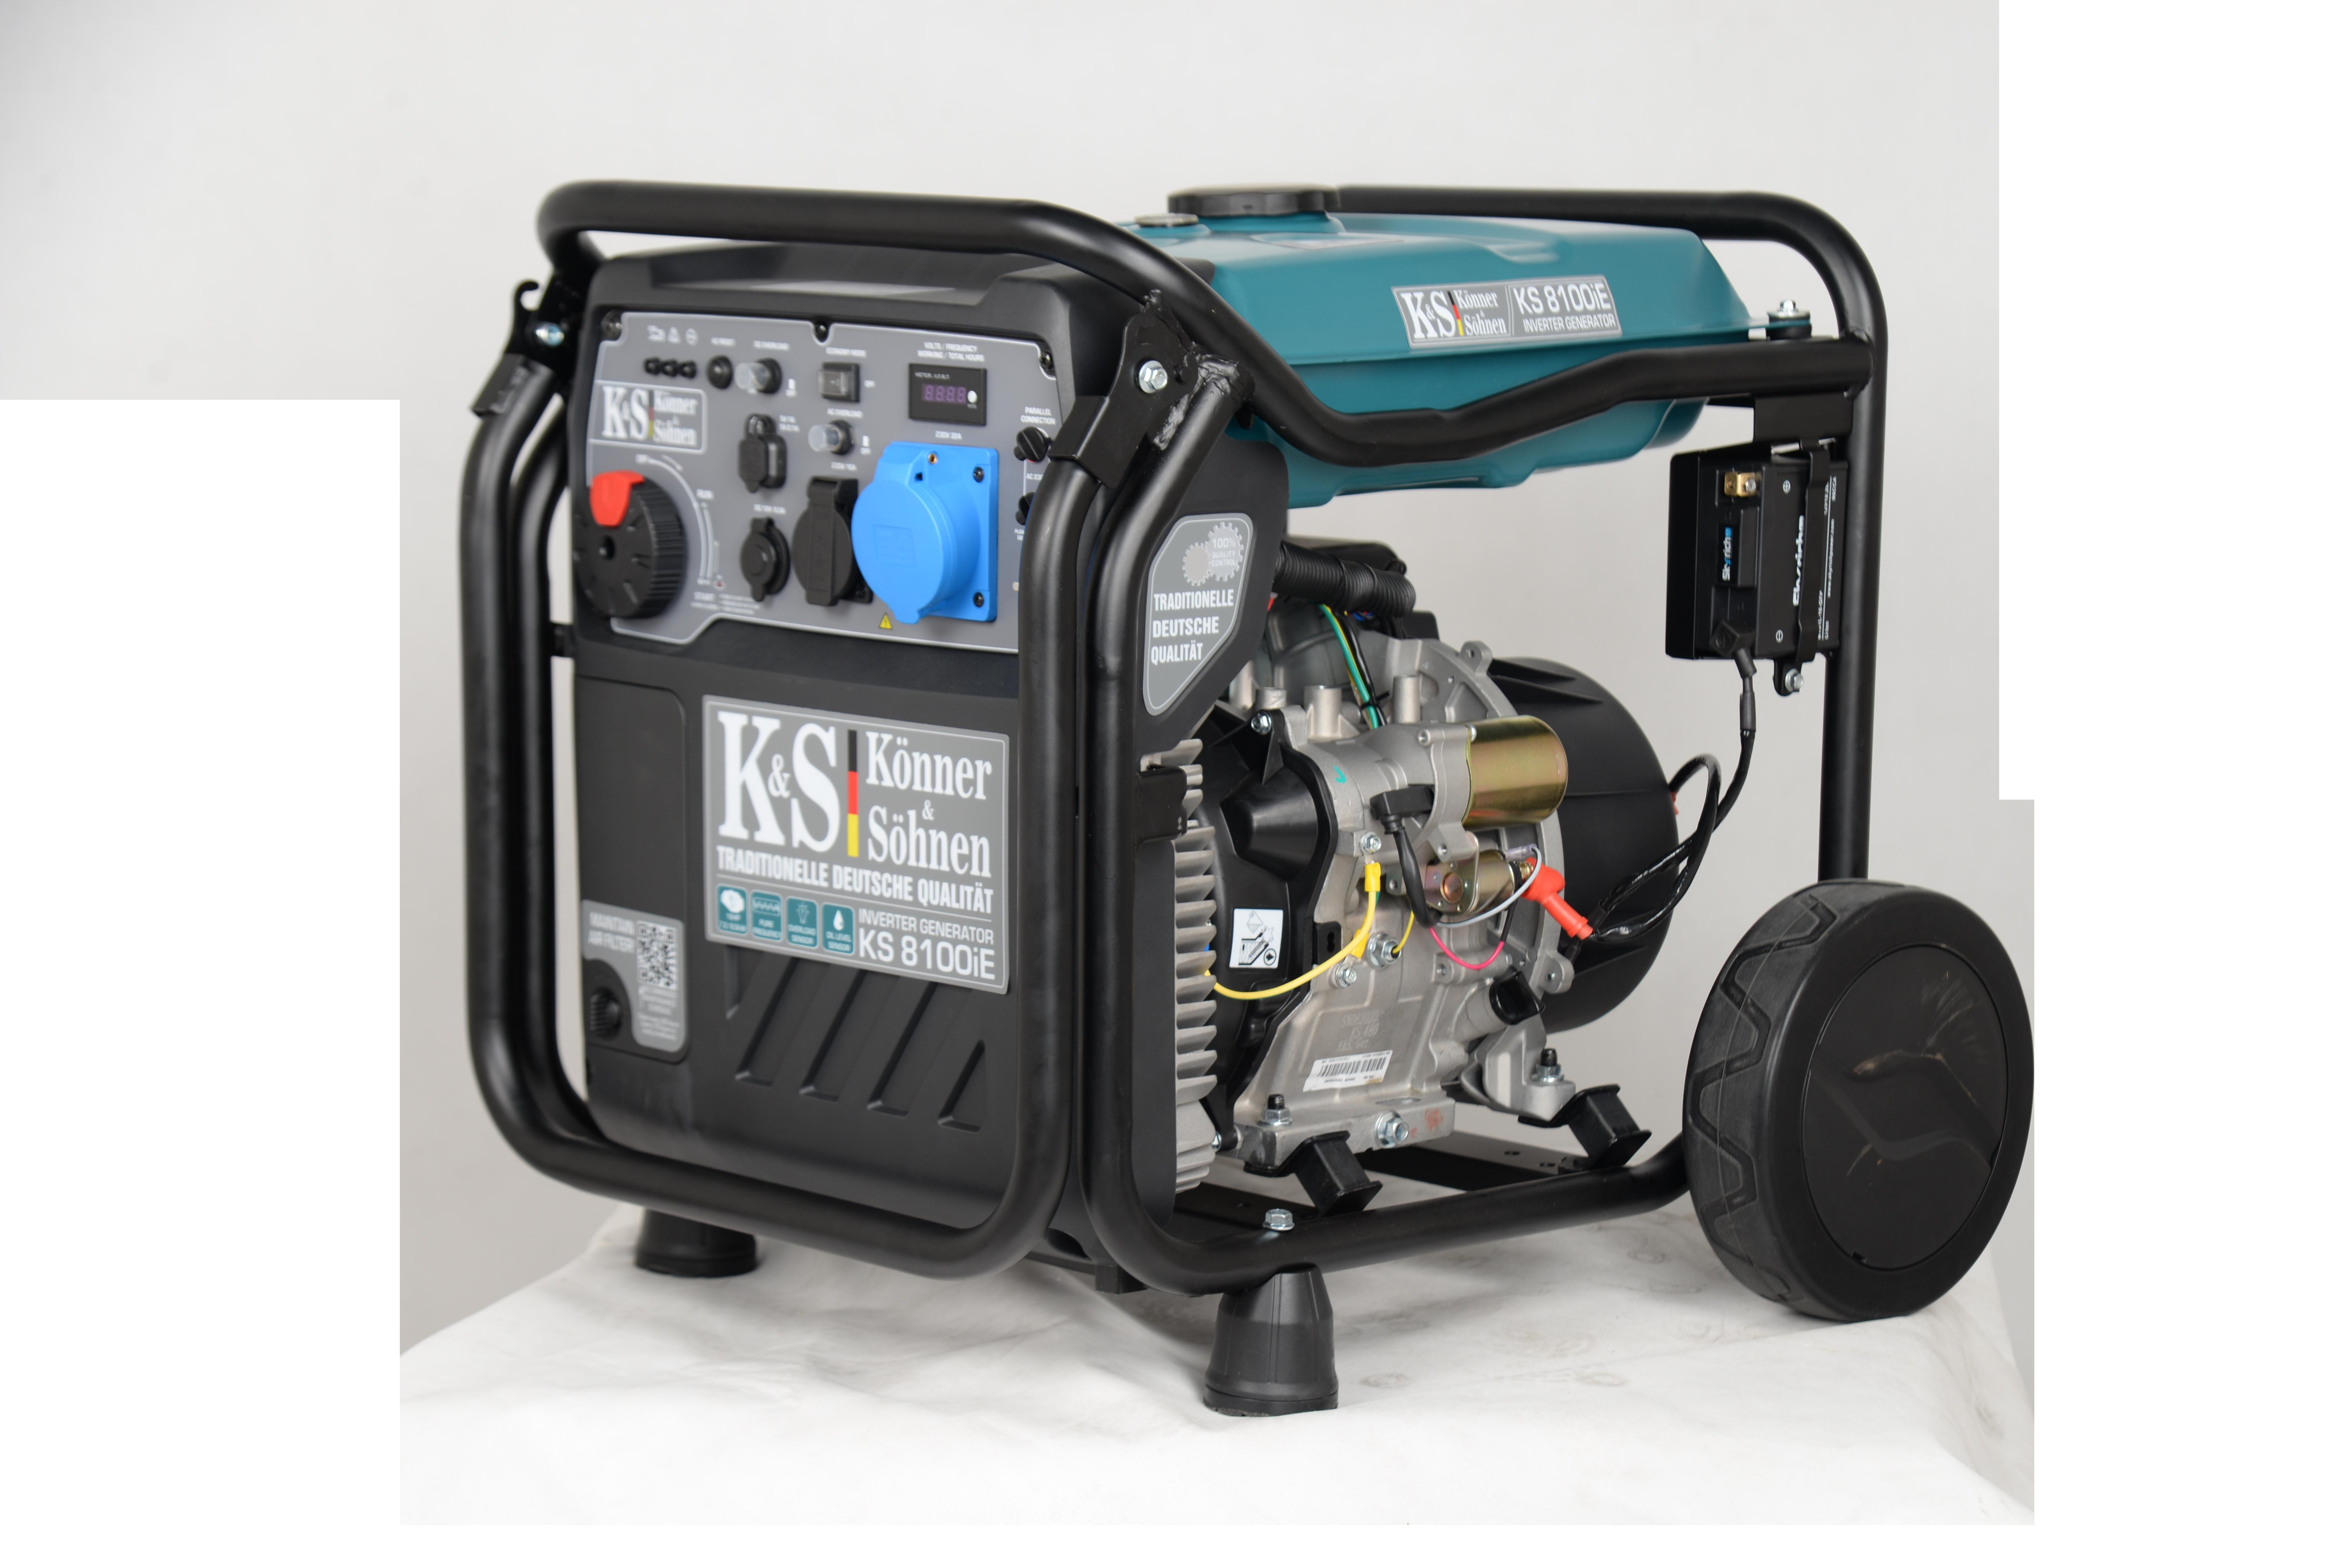 VORVERKAUF!!! K&S Inverter 8.000 Watt Benzin KS8100iE-ATSR Stromaggregat auch Werkzeuge